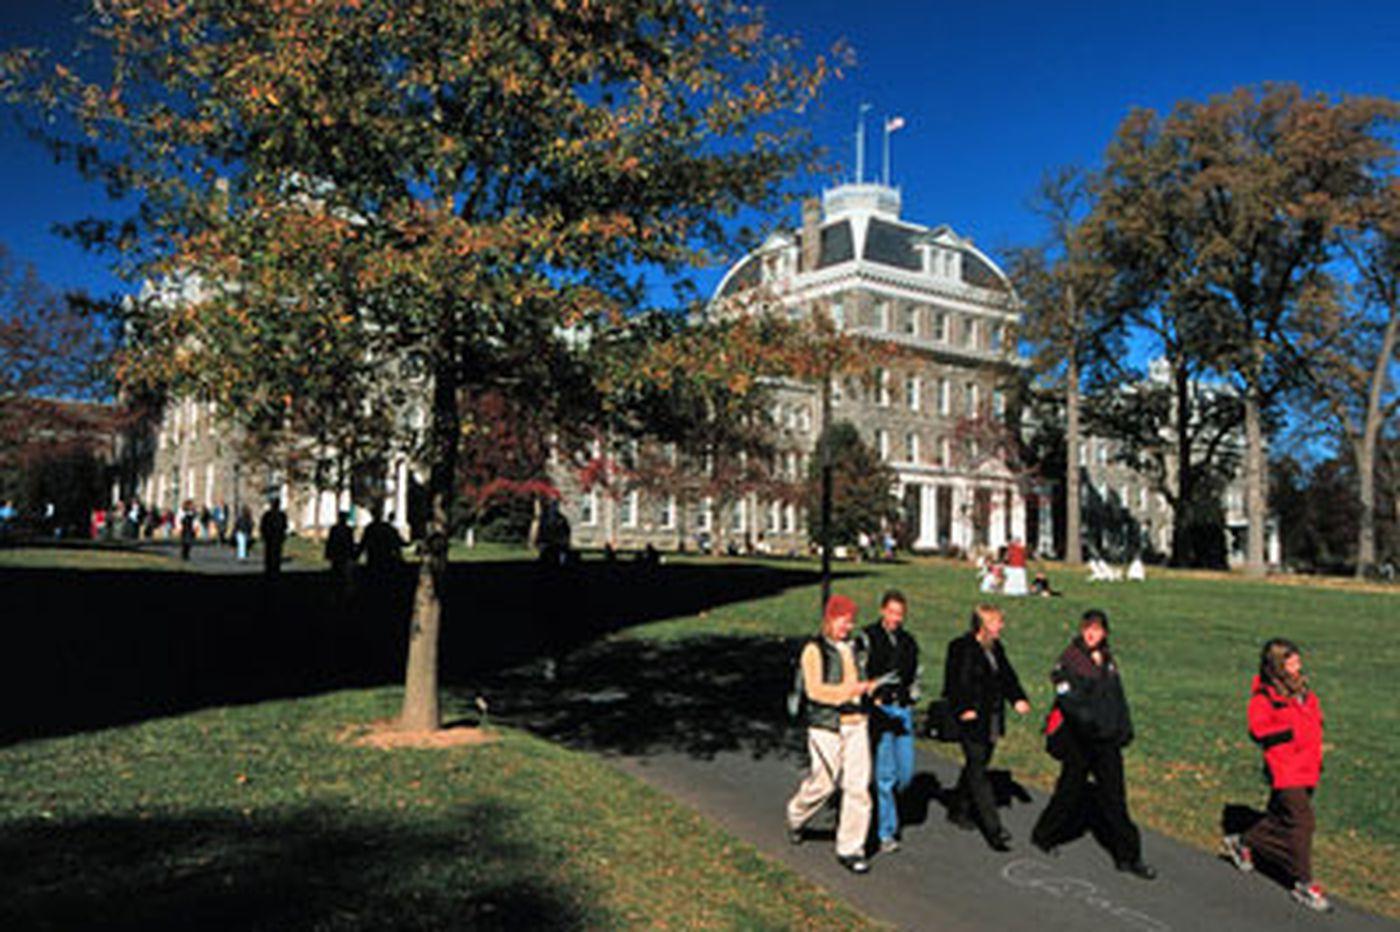 High ranks for Swarthmore